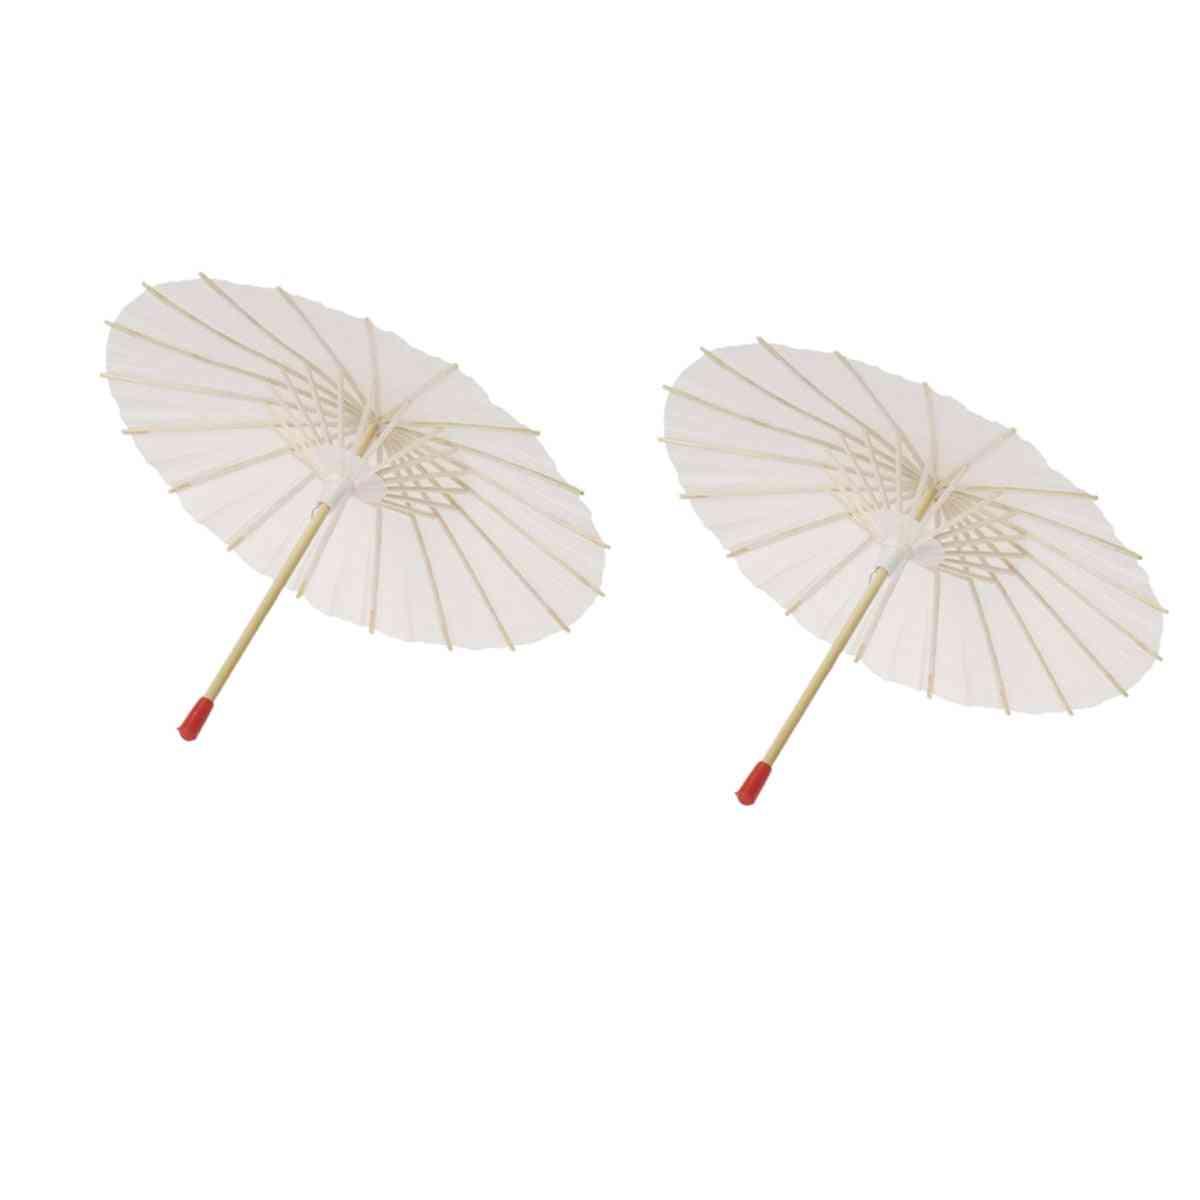 Paper Parasol Craft Decorative Umbrella For Baby Shower/anniversary/wedding/birthday